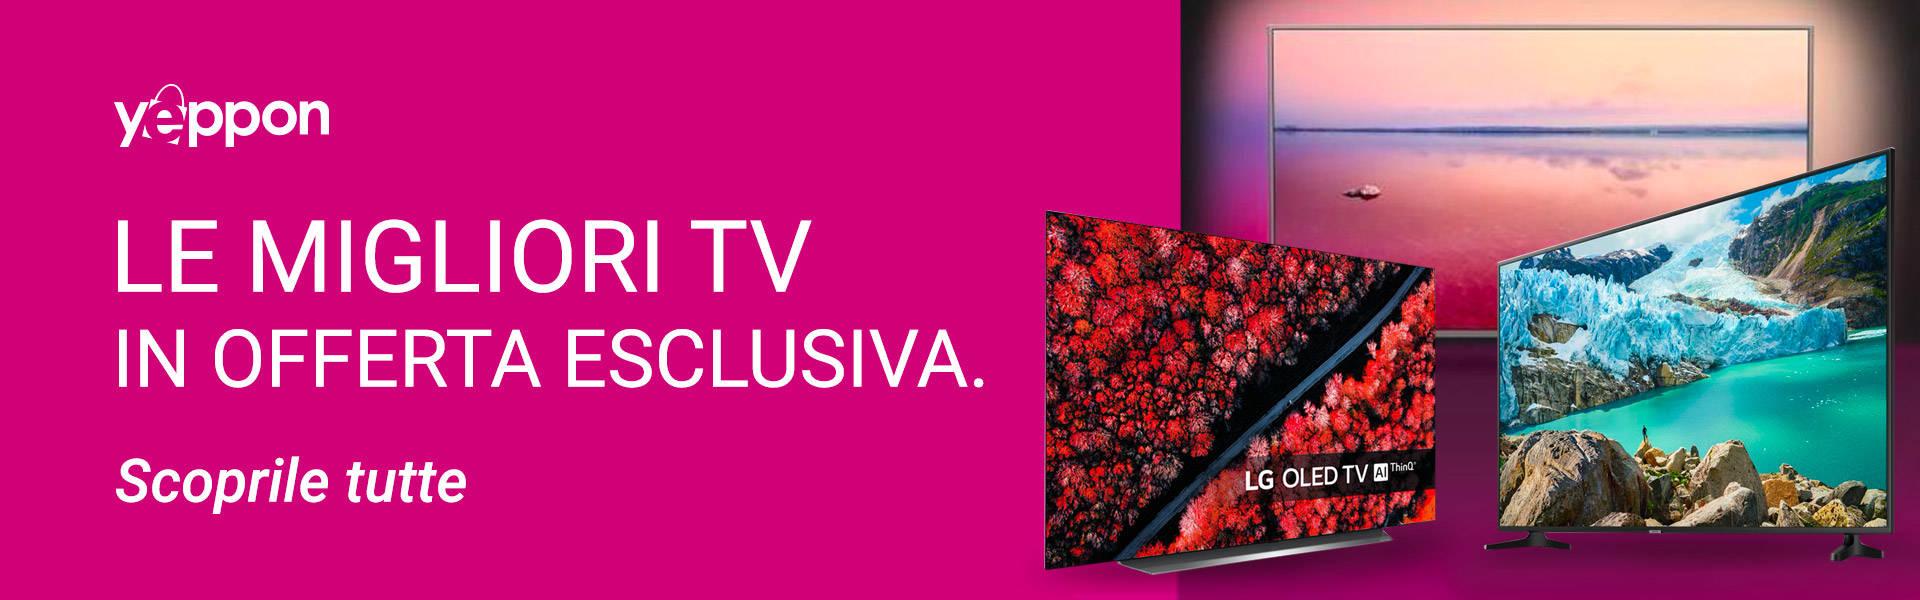 Offerte Yeppon - smart tv - febbraio 2020